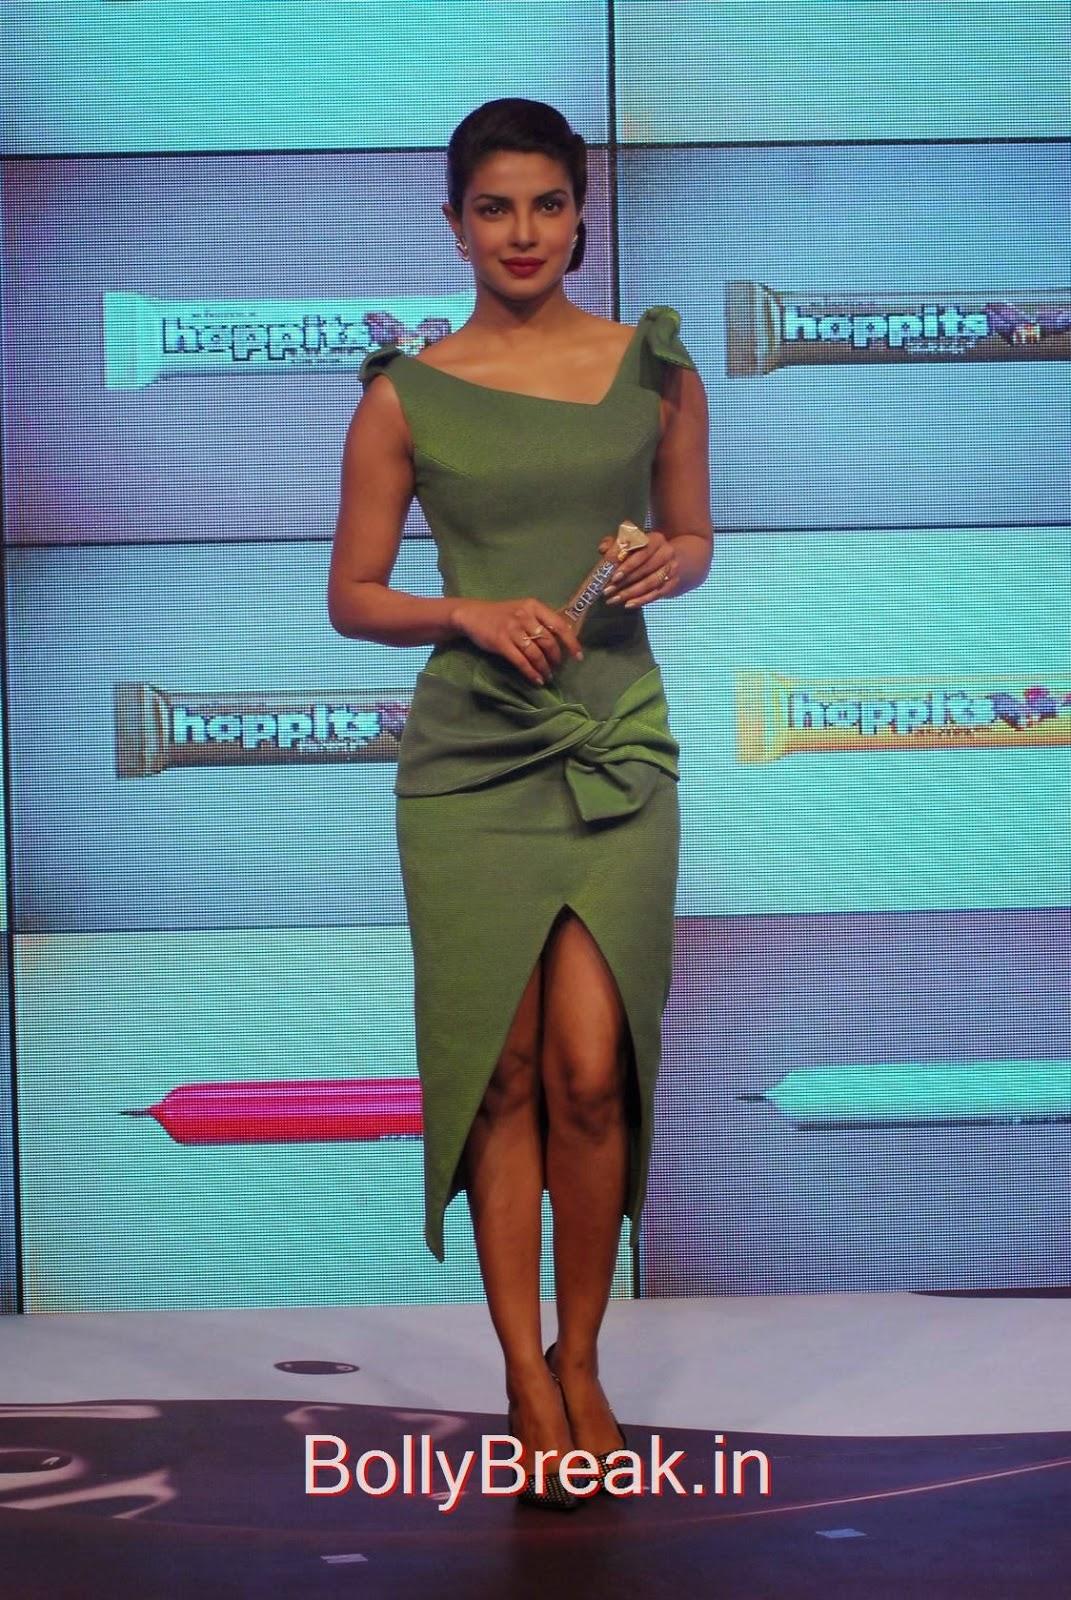 Priyanka Chopra Unseen Stills, Priyanka Chopra Hot Pics in green dress from Hoppit Chocolate Launch